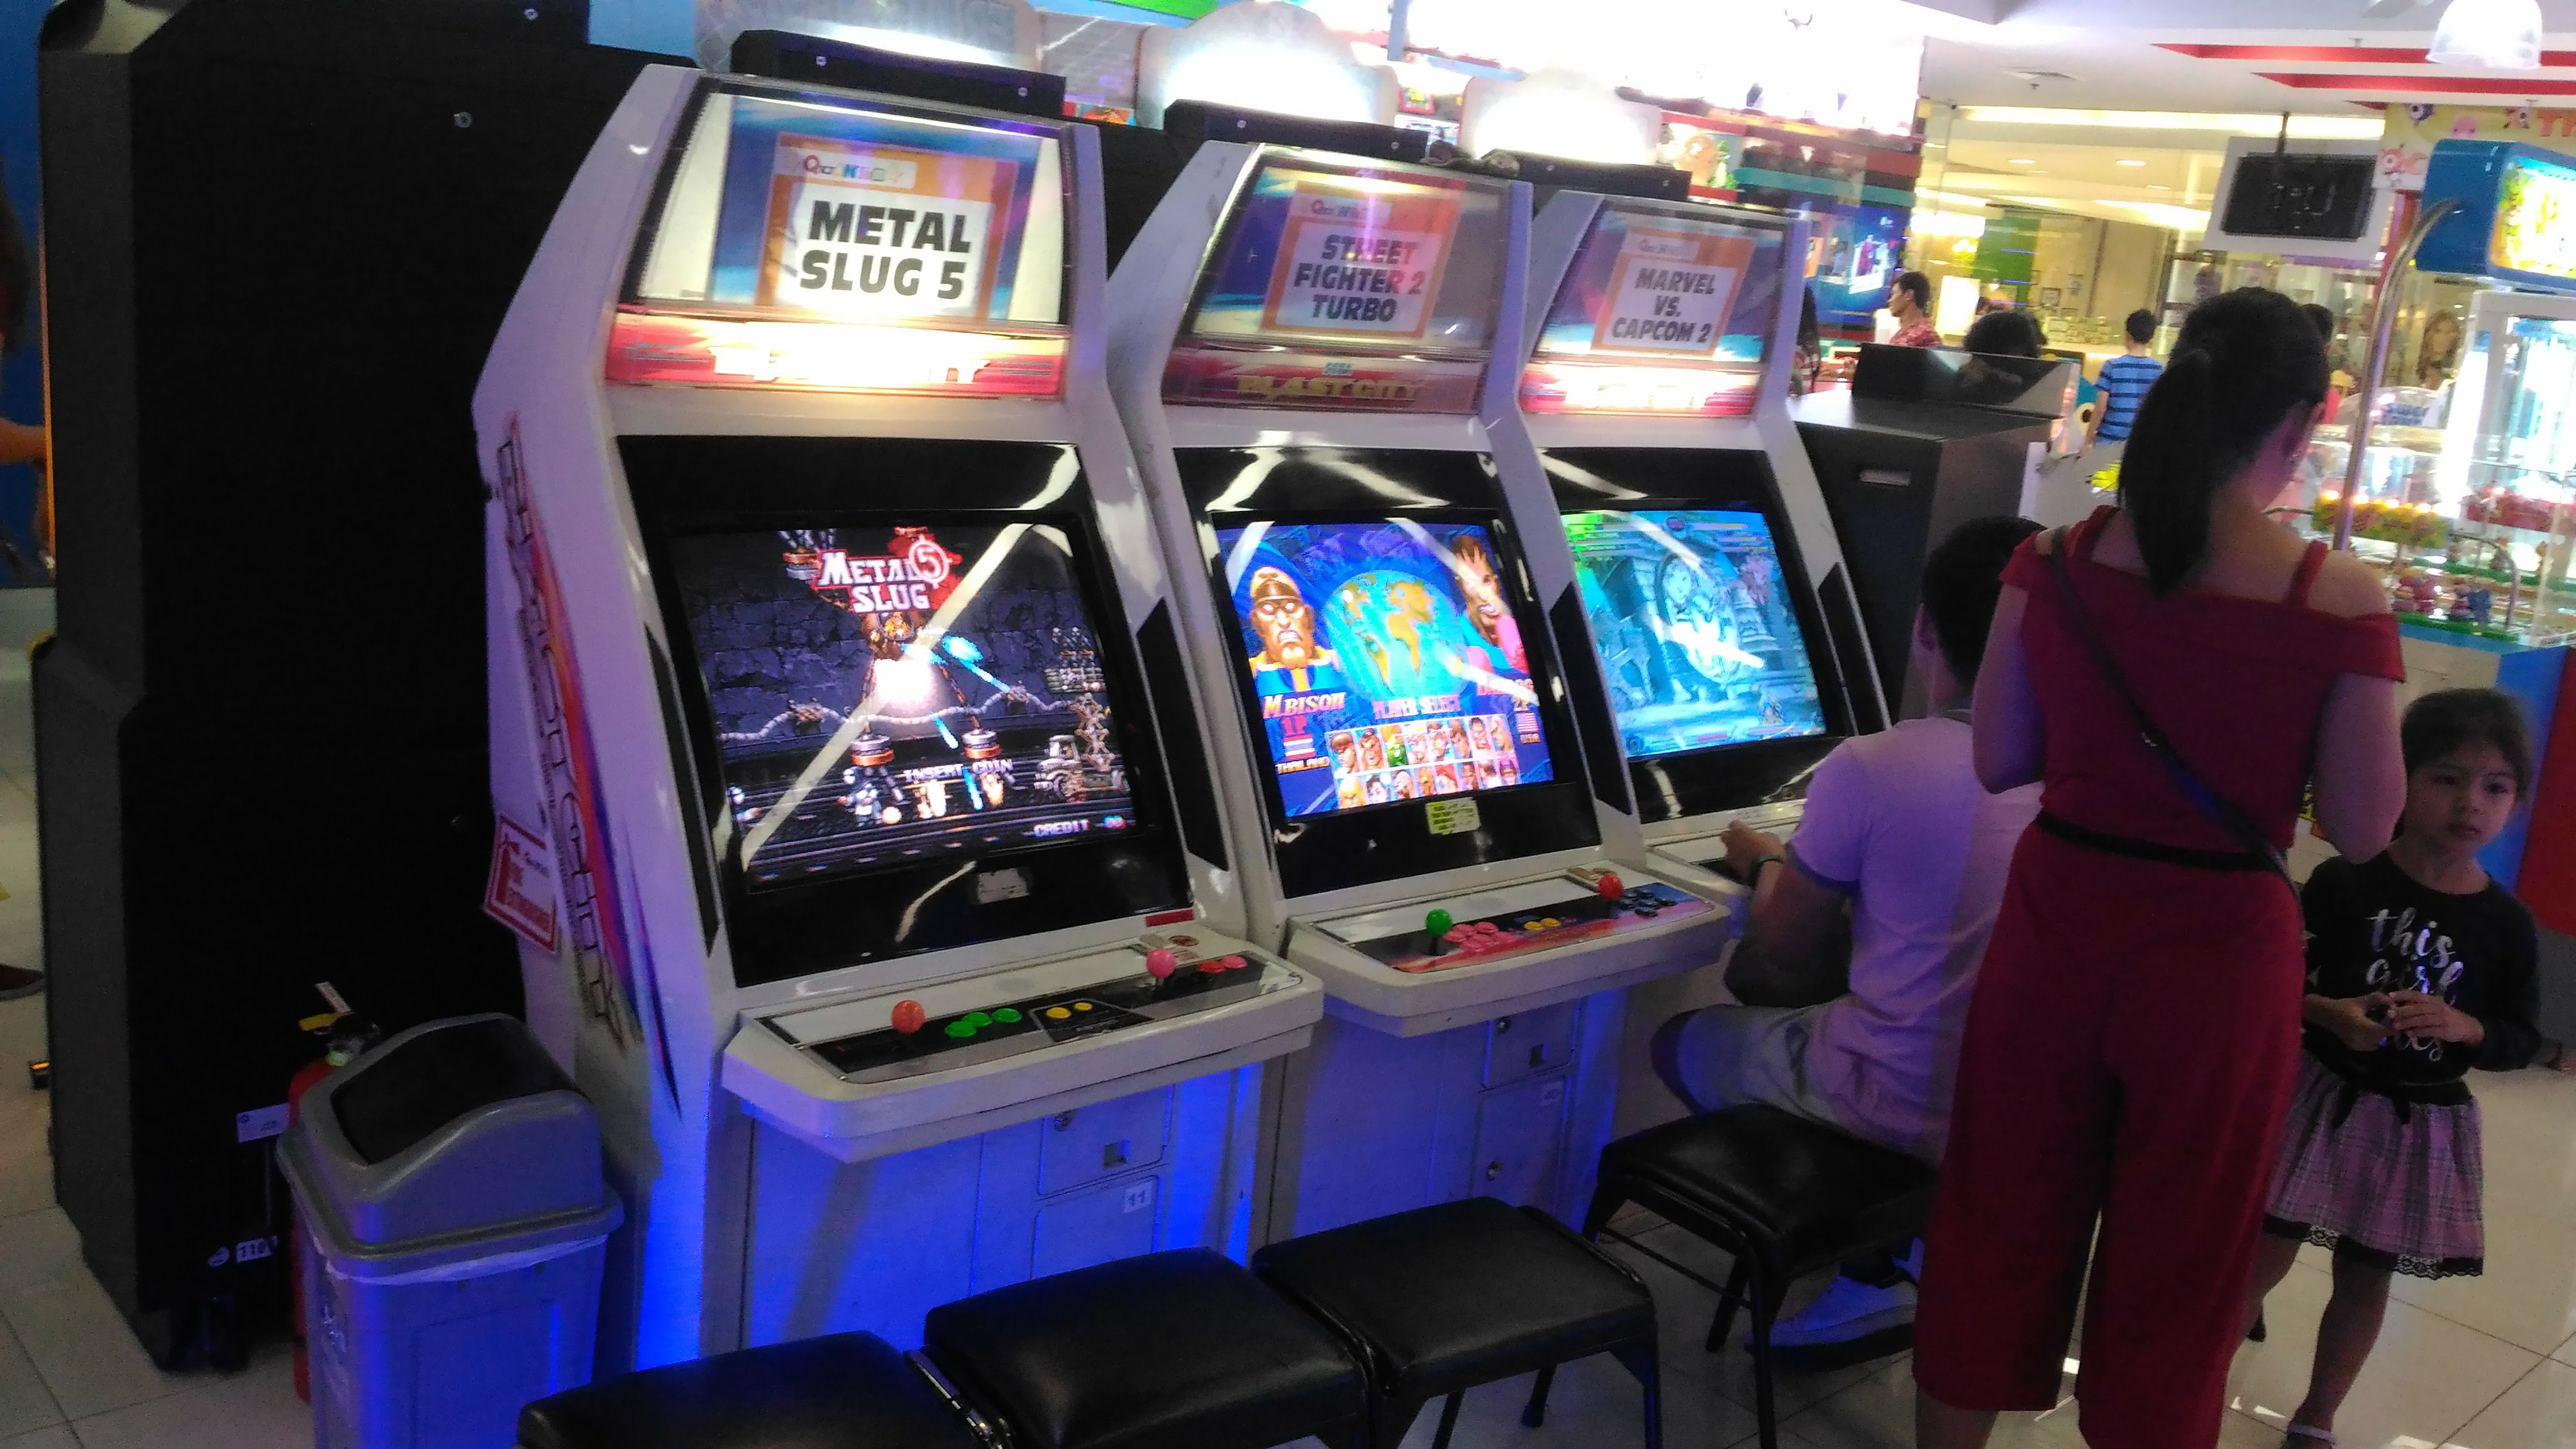 3 sega blast city candy cabinets arcade locations picture